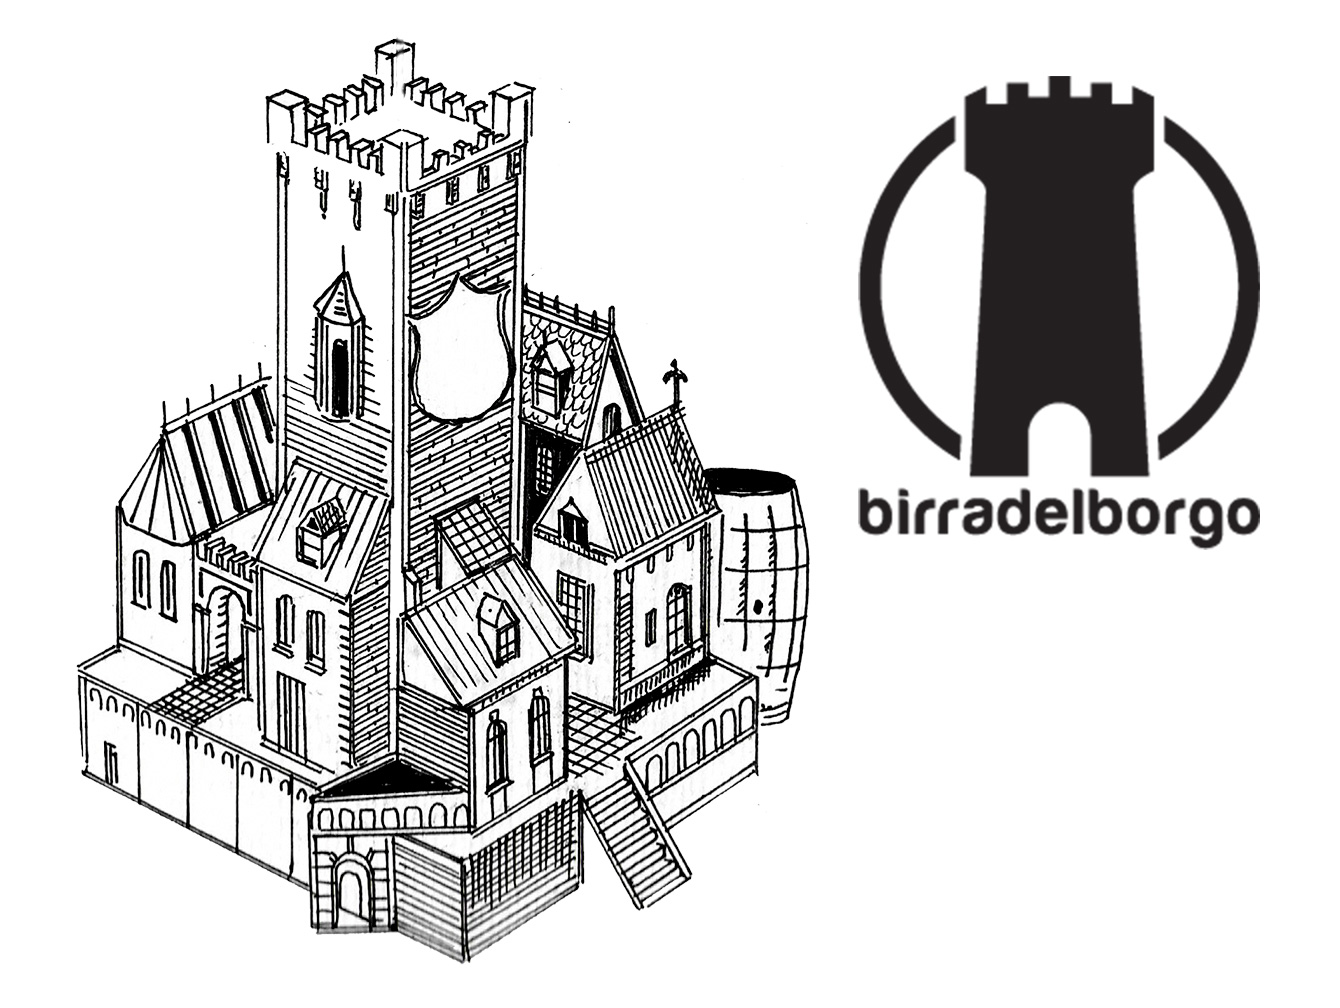 The Brewery Birra Del Borgo